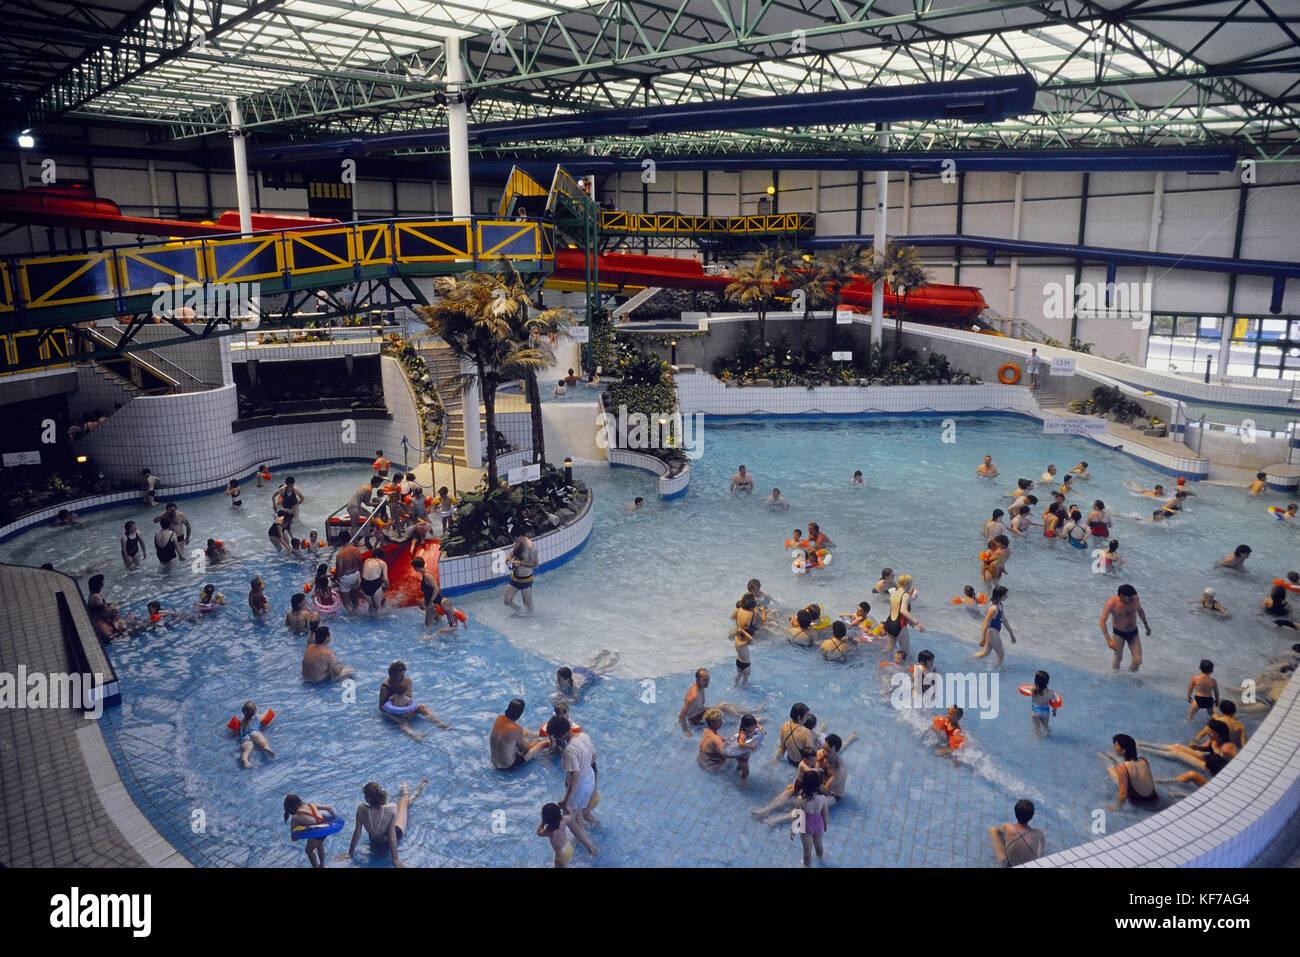 Butlins camp stock photos butlins camp stock images alamy for Bognor regis butlins swimming pool